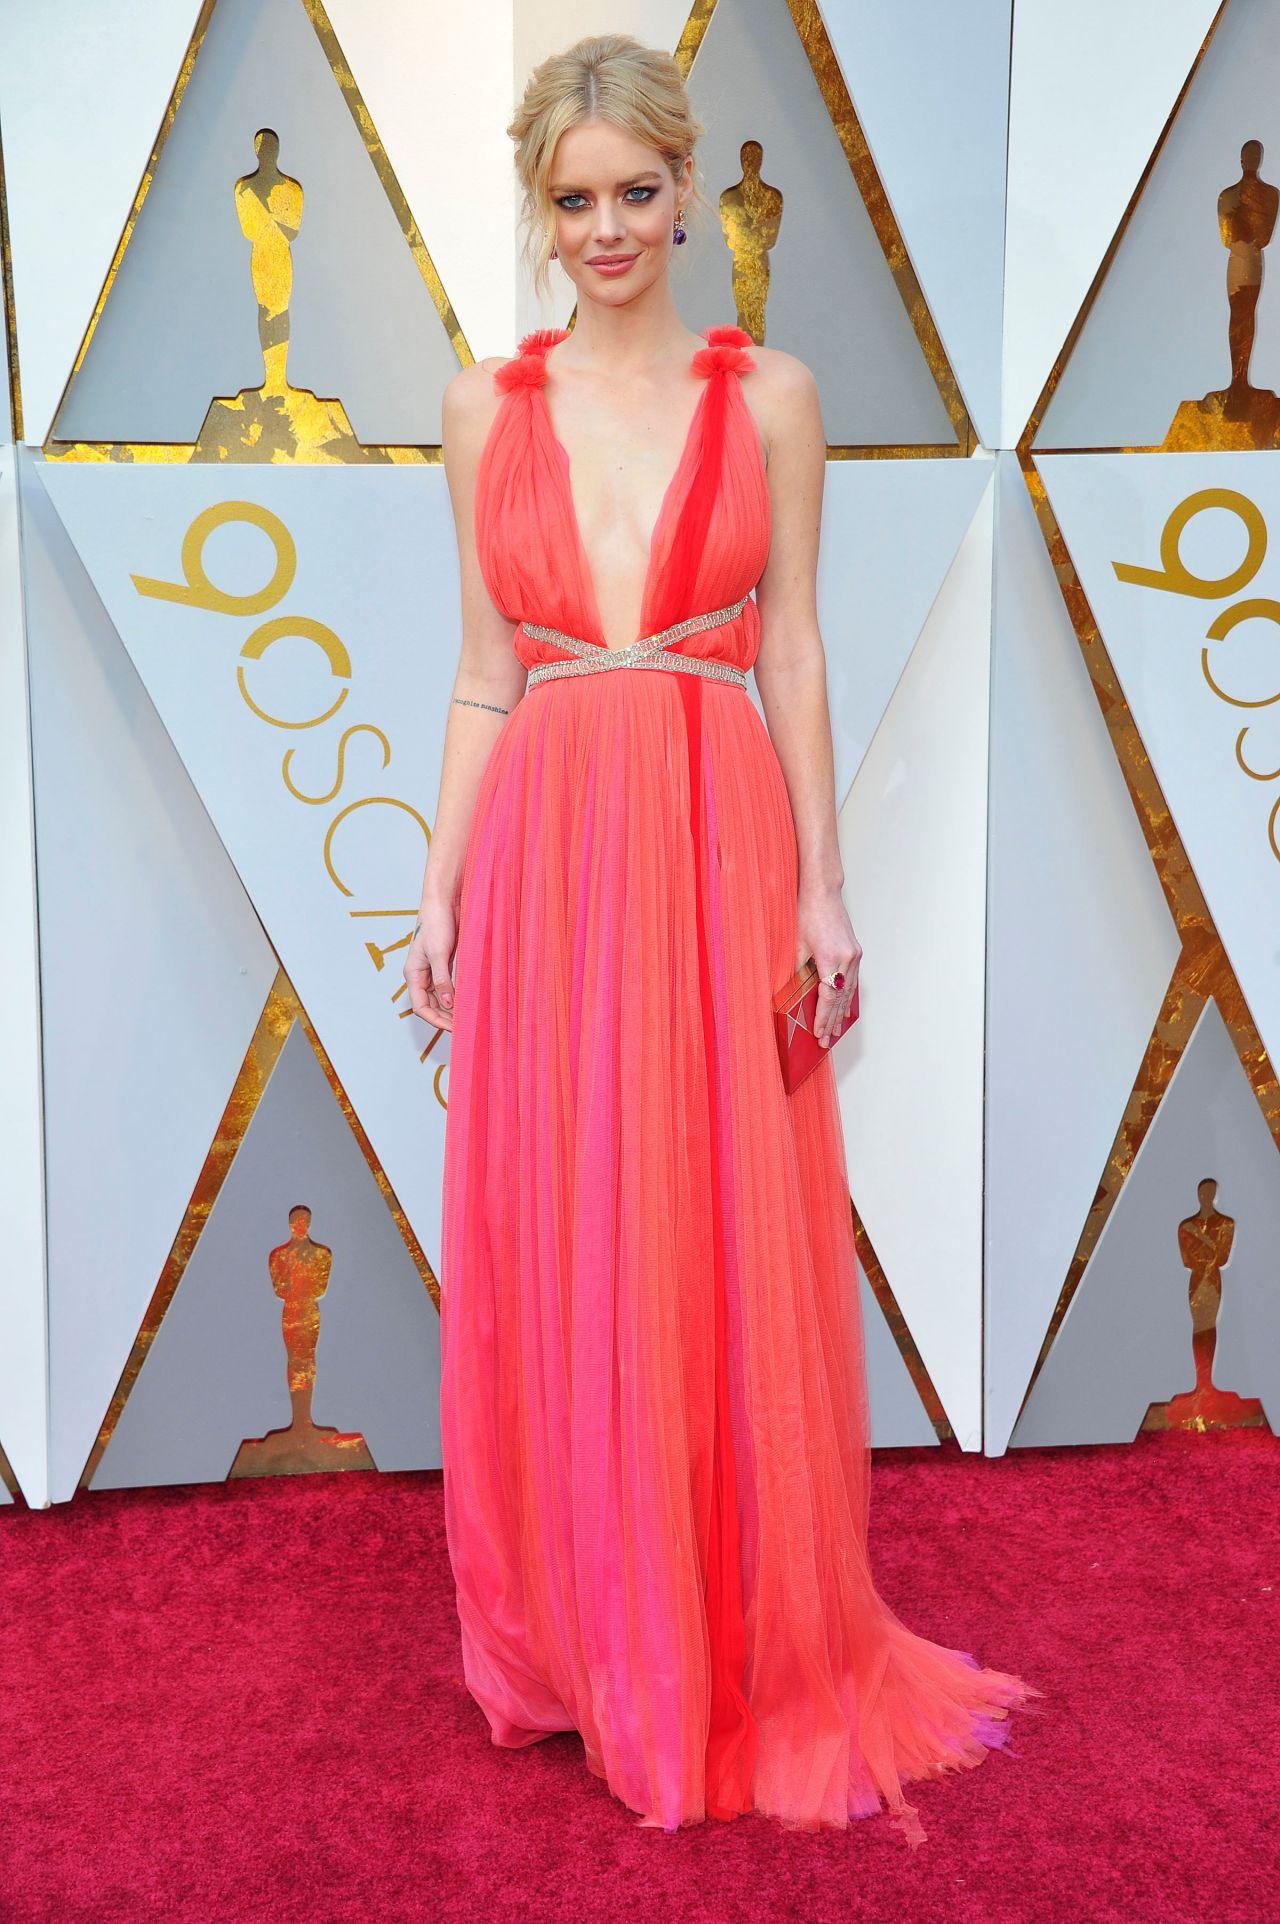 Samara Weaving Oscars 2018 Red Carpet